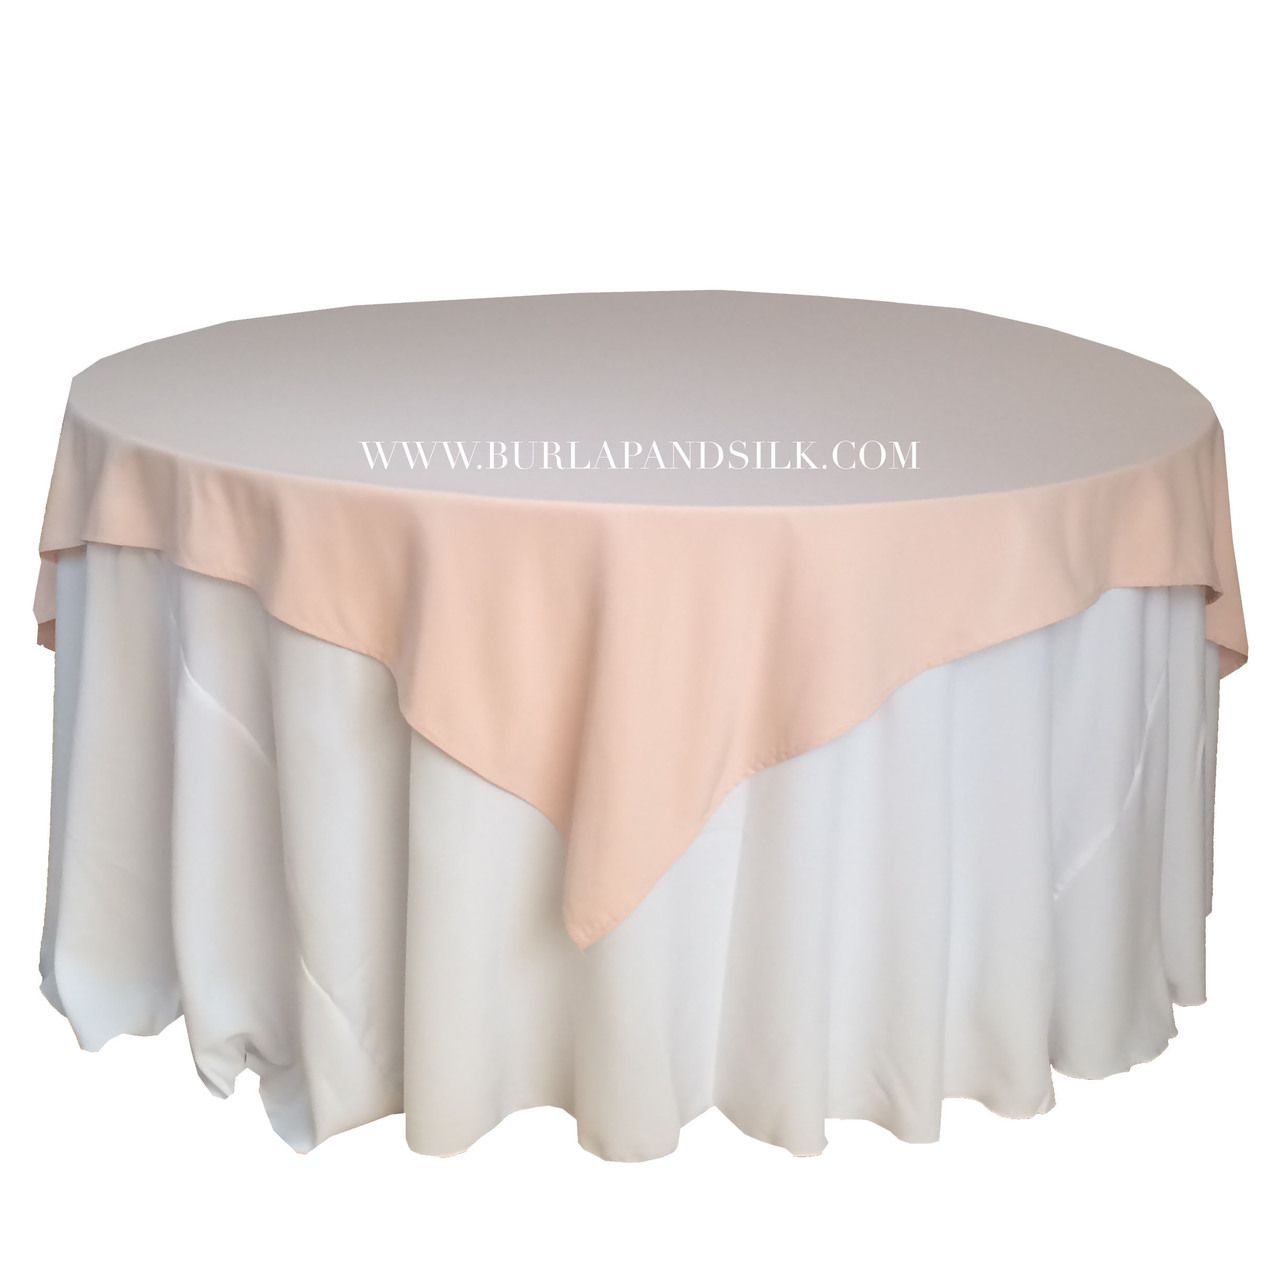 72 x 72 inches square blush tablecloth wedding table linenswedding